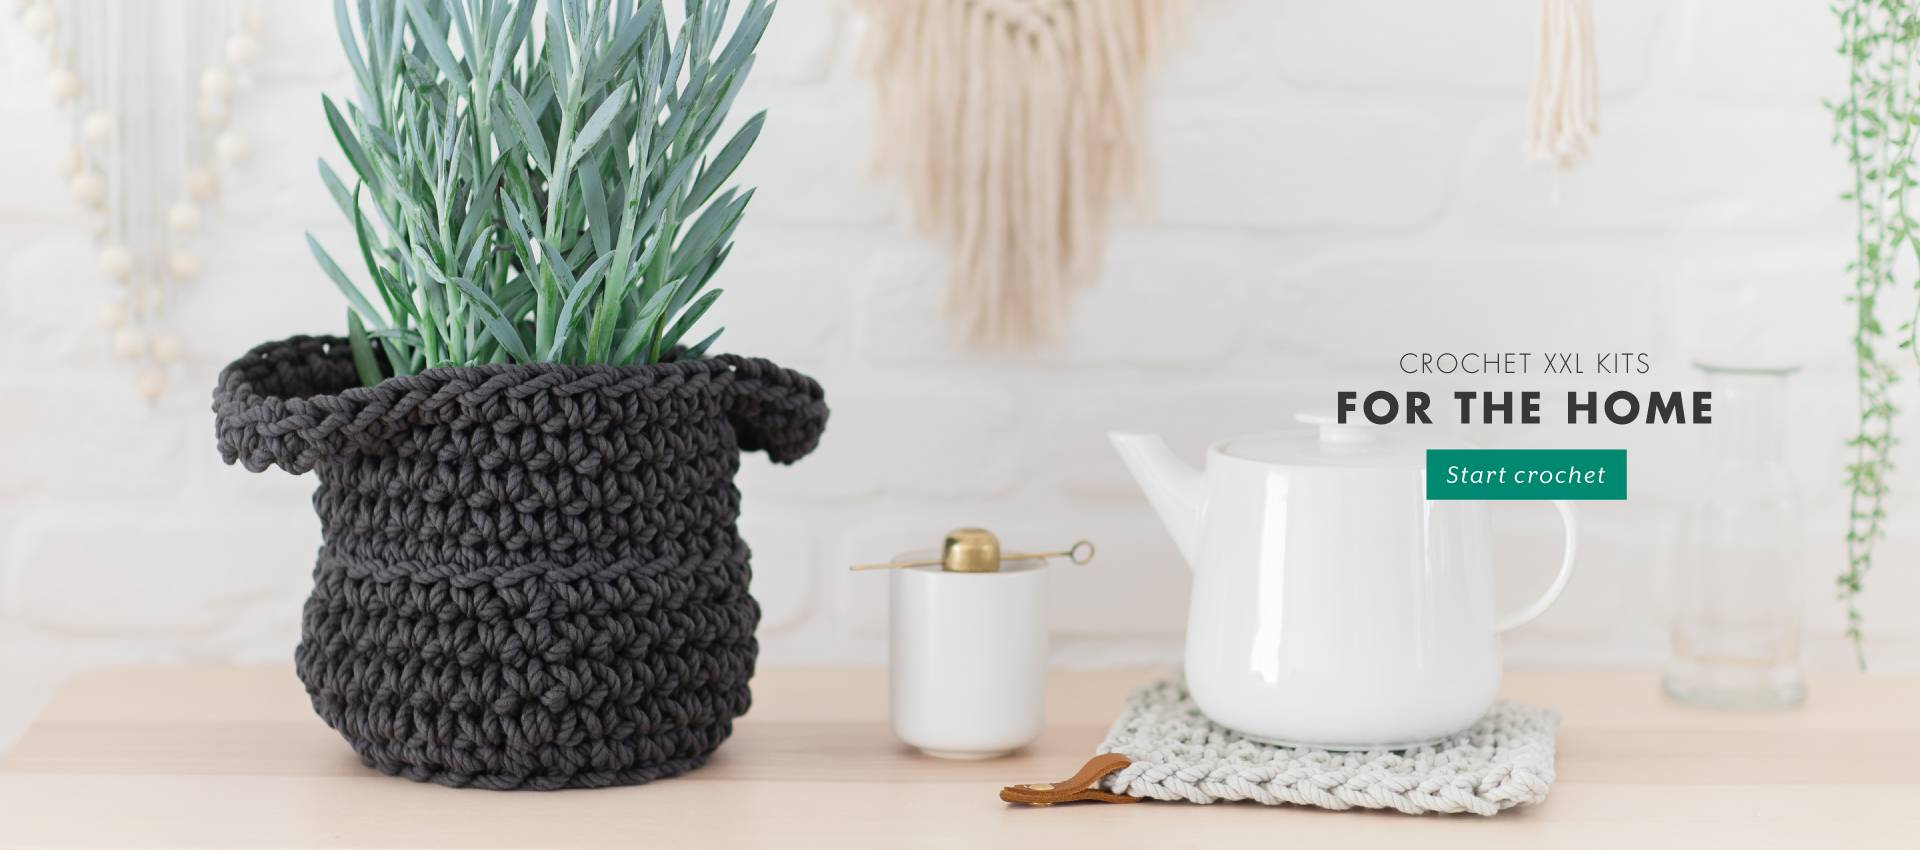 Ready-to-create: crochet kits for interior